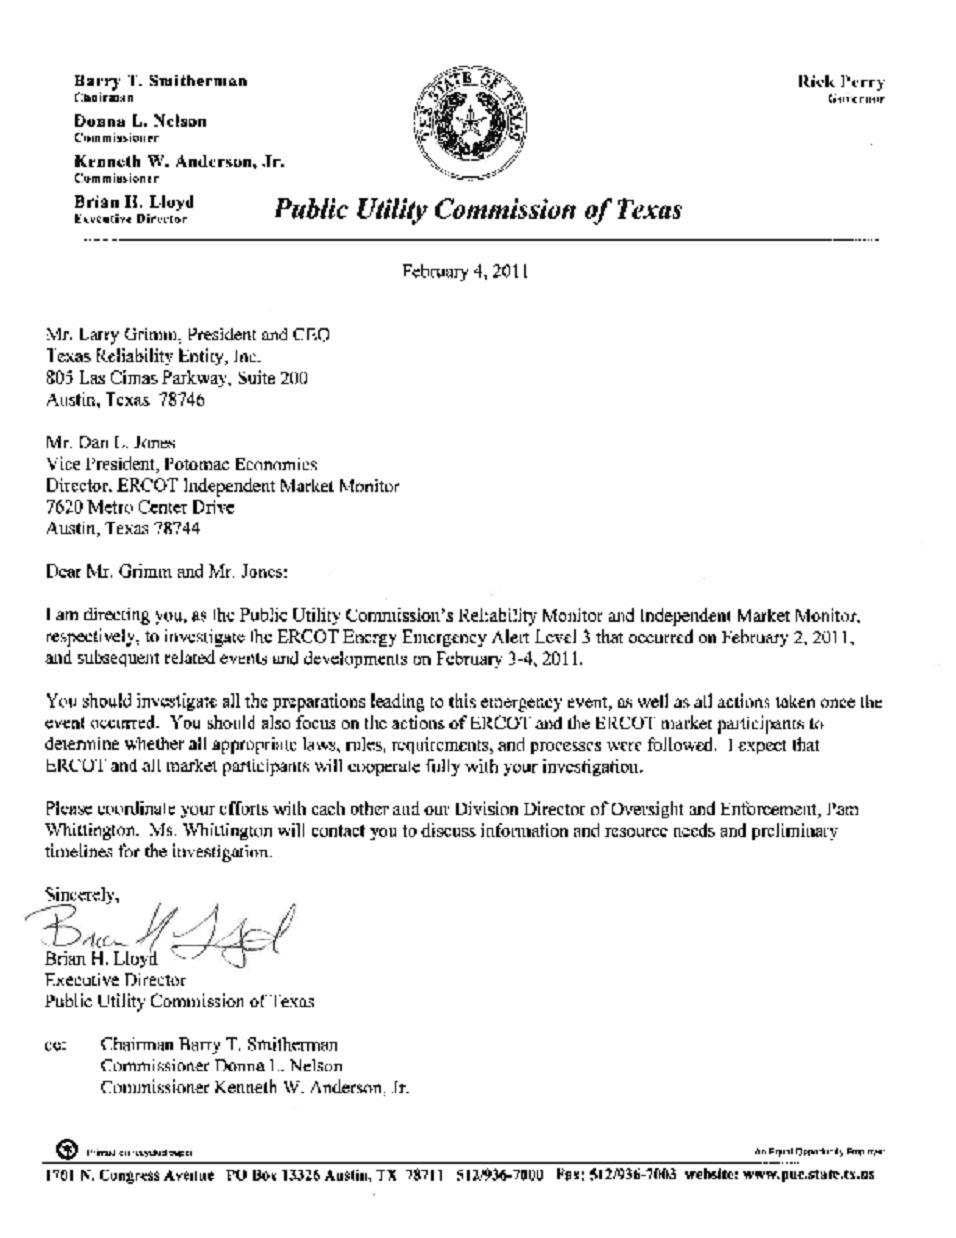 PUC rolling blackout investigation letter